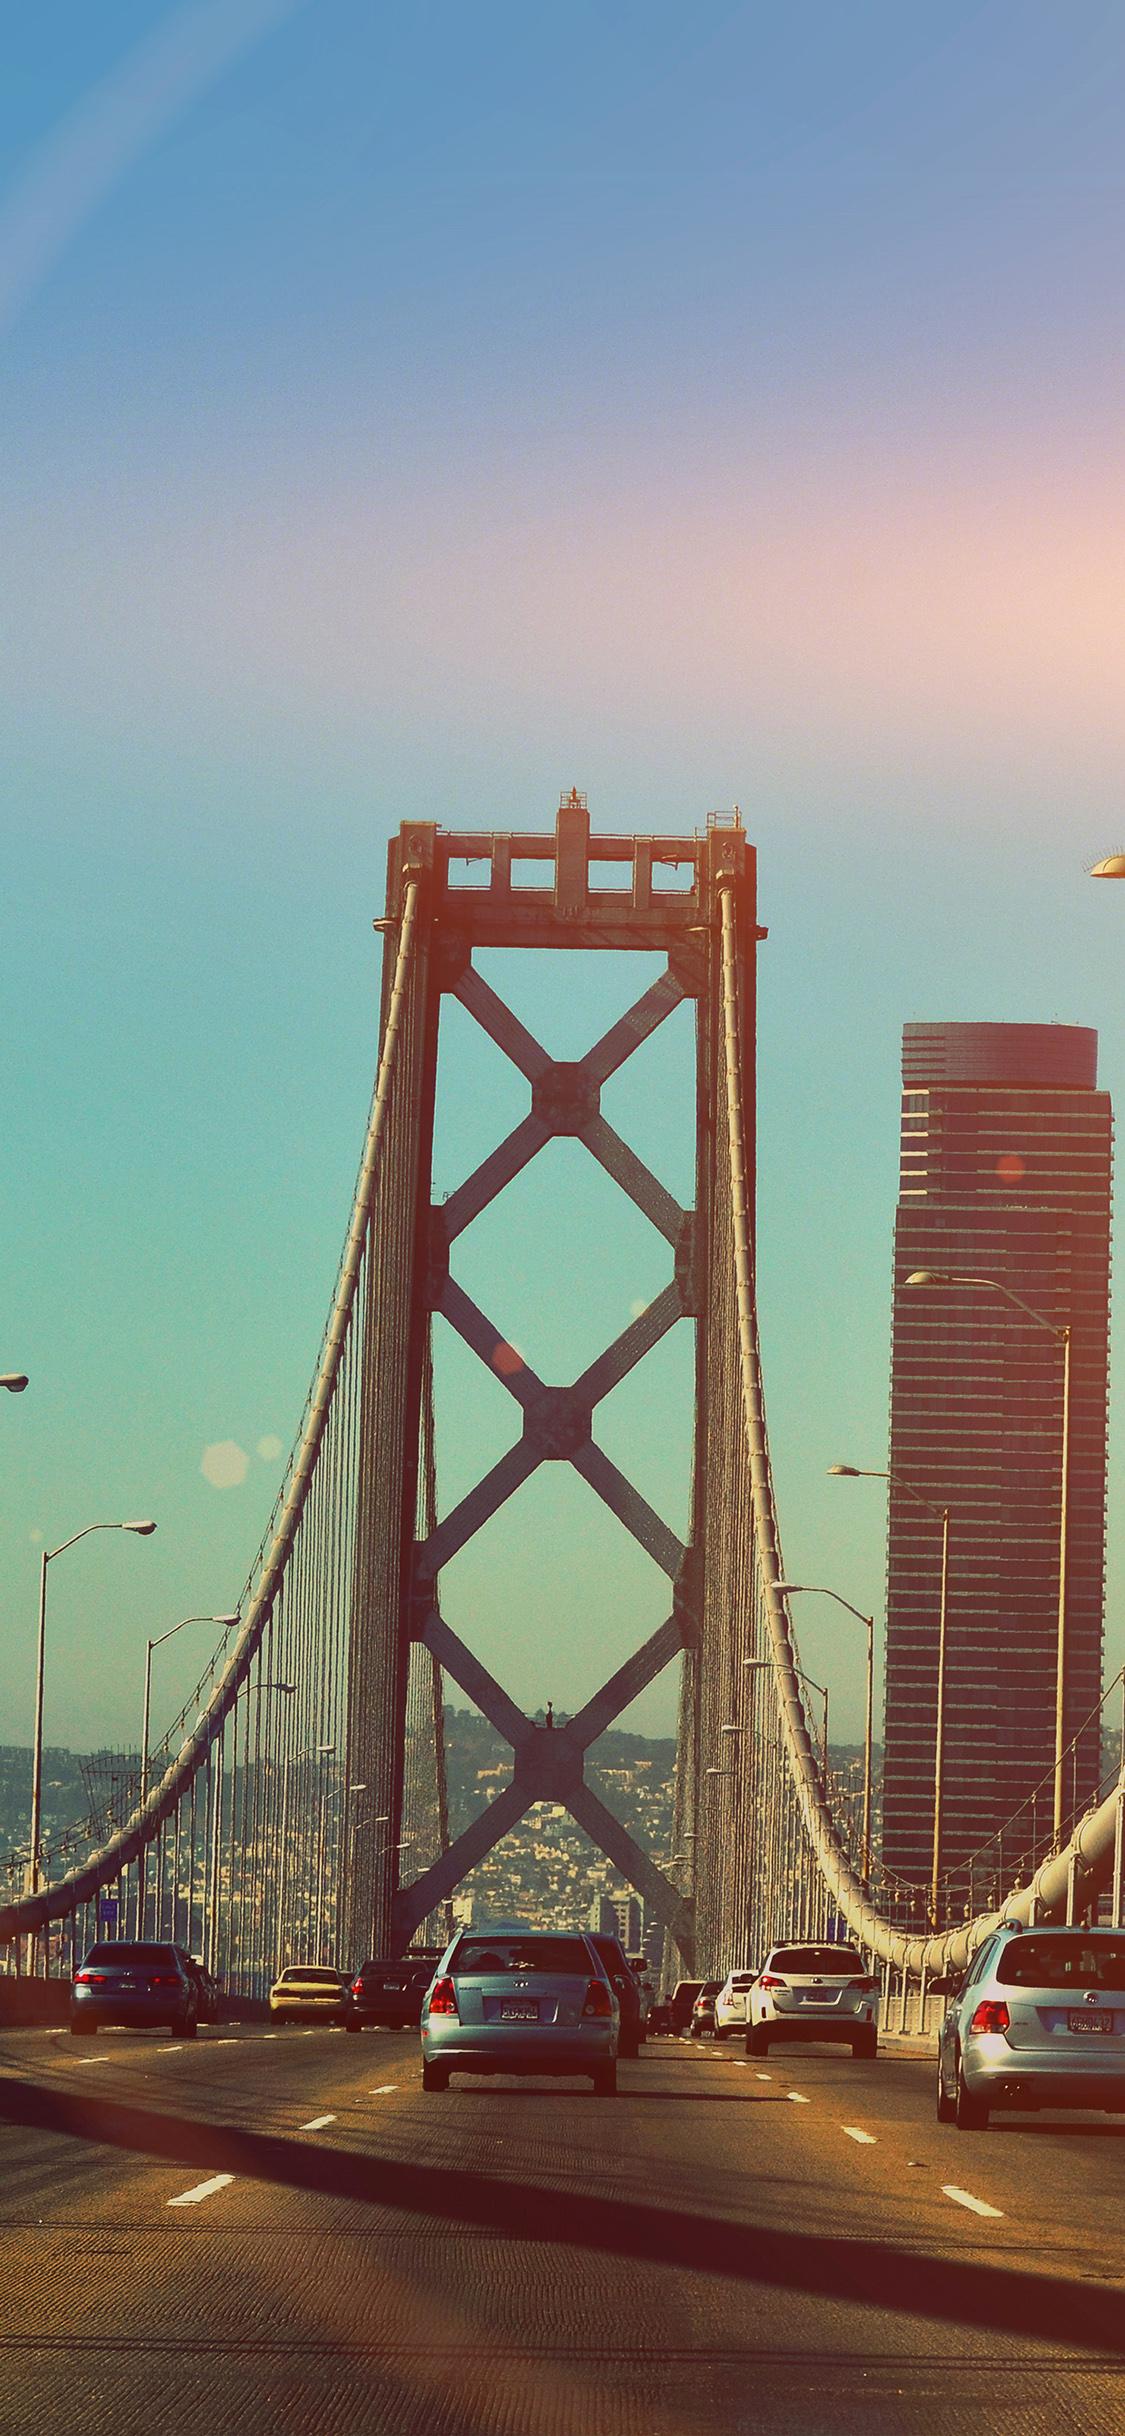 iPhonexpapers.com-Apple-iPhone-wallpaper-na14-city-bridge-river-building-day-flare